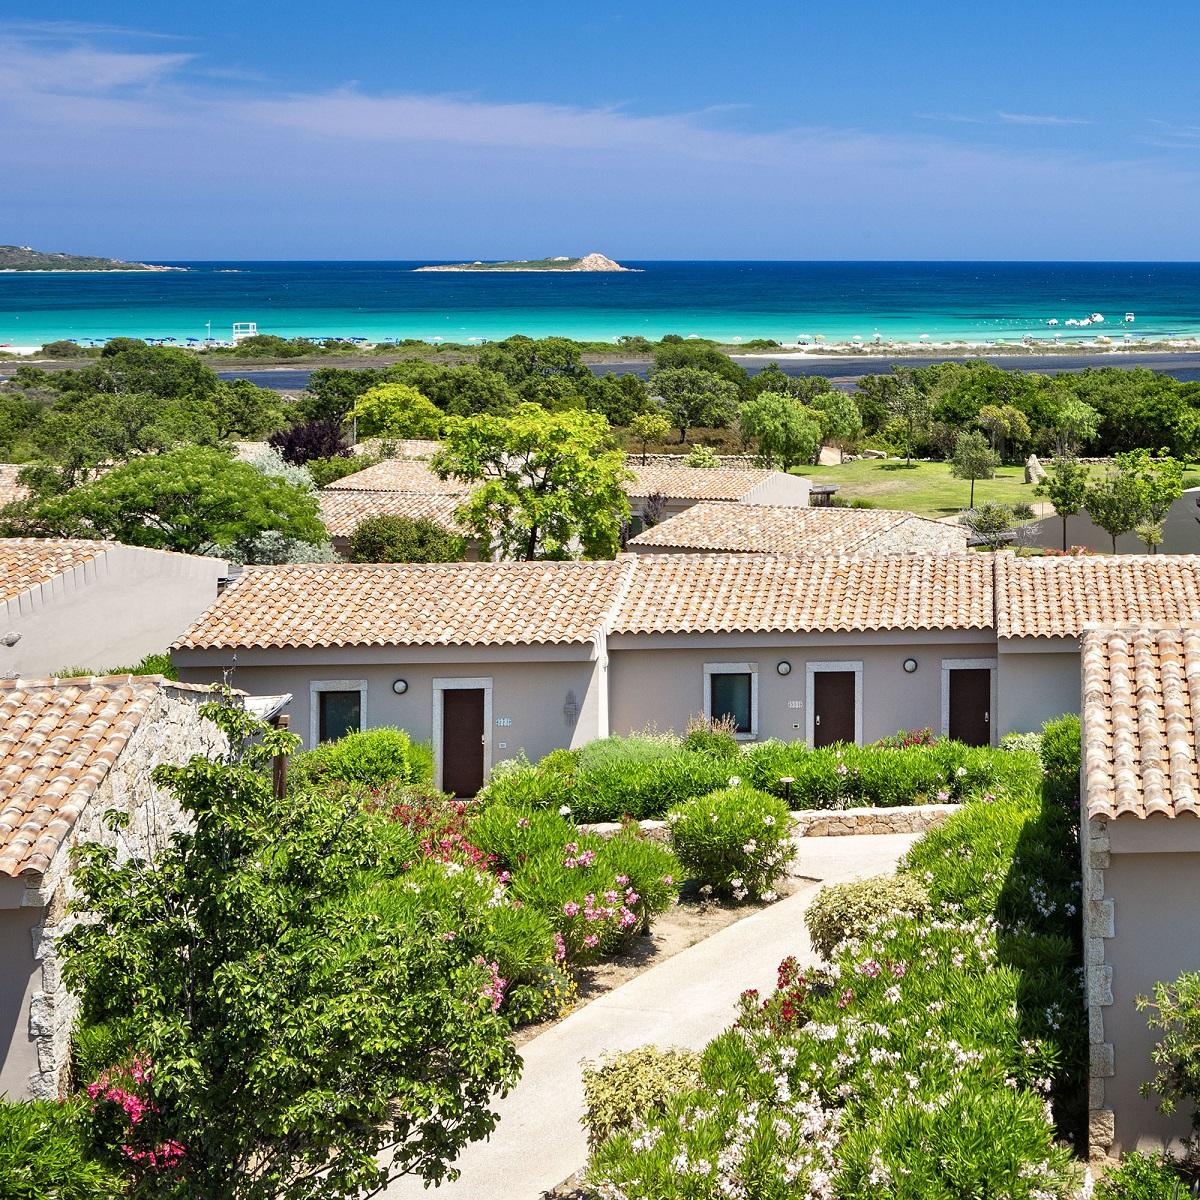 Baglioni Resort Sardinien (5)